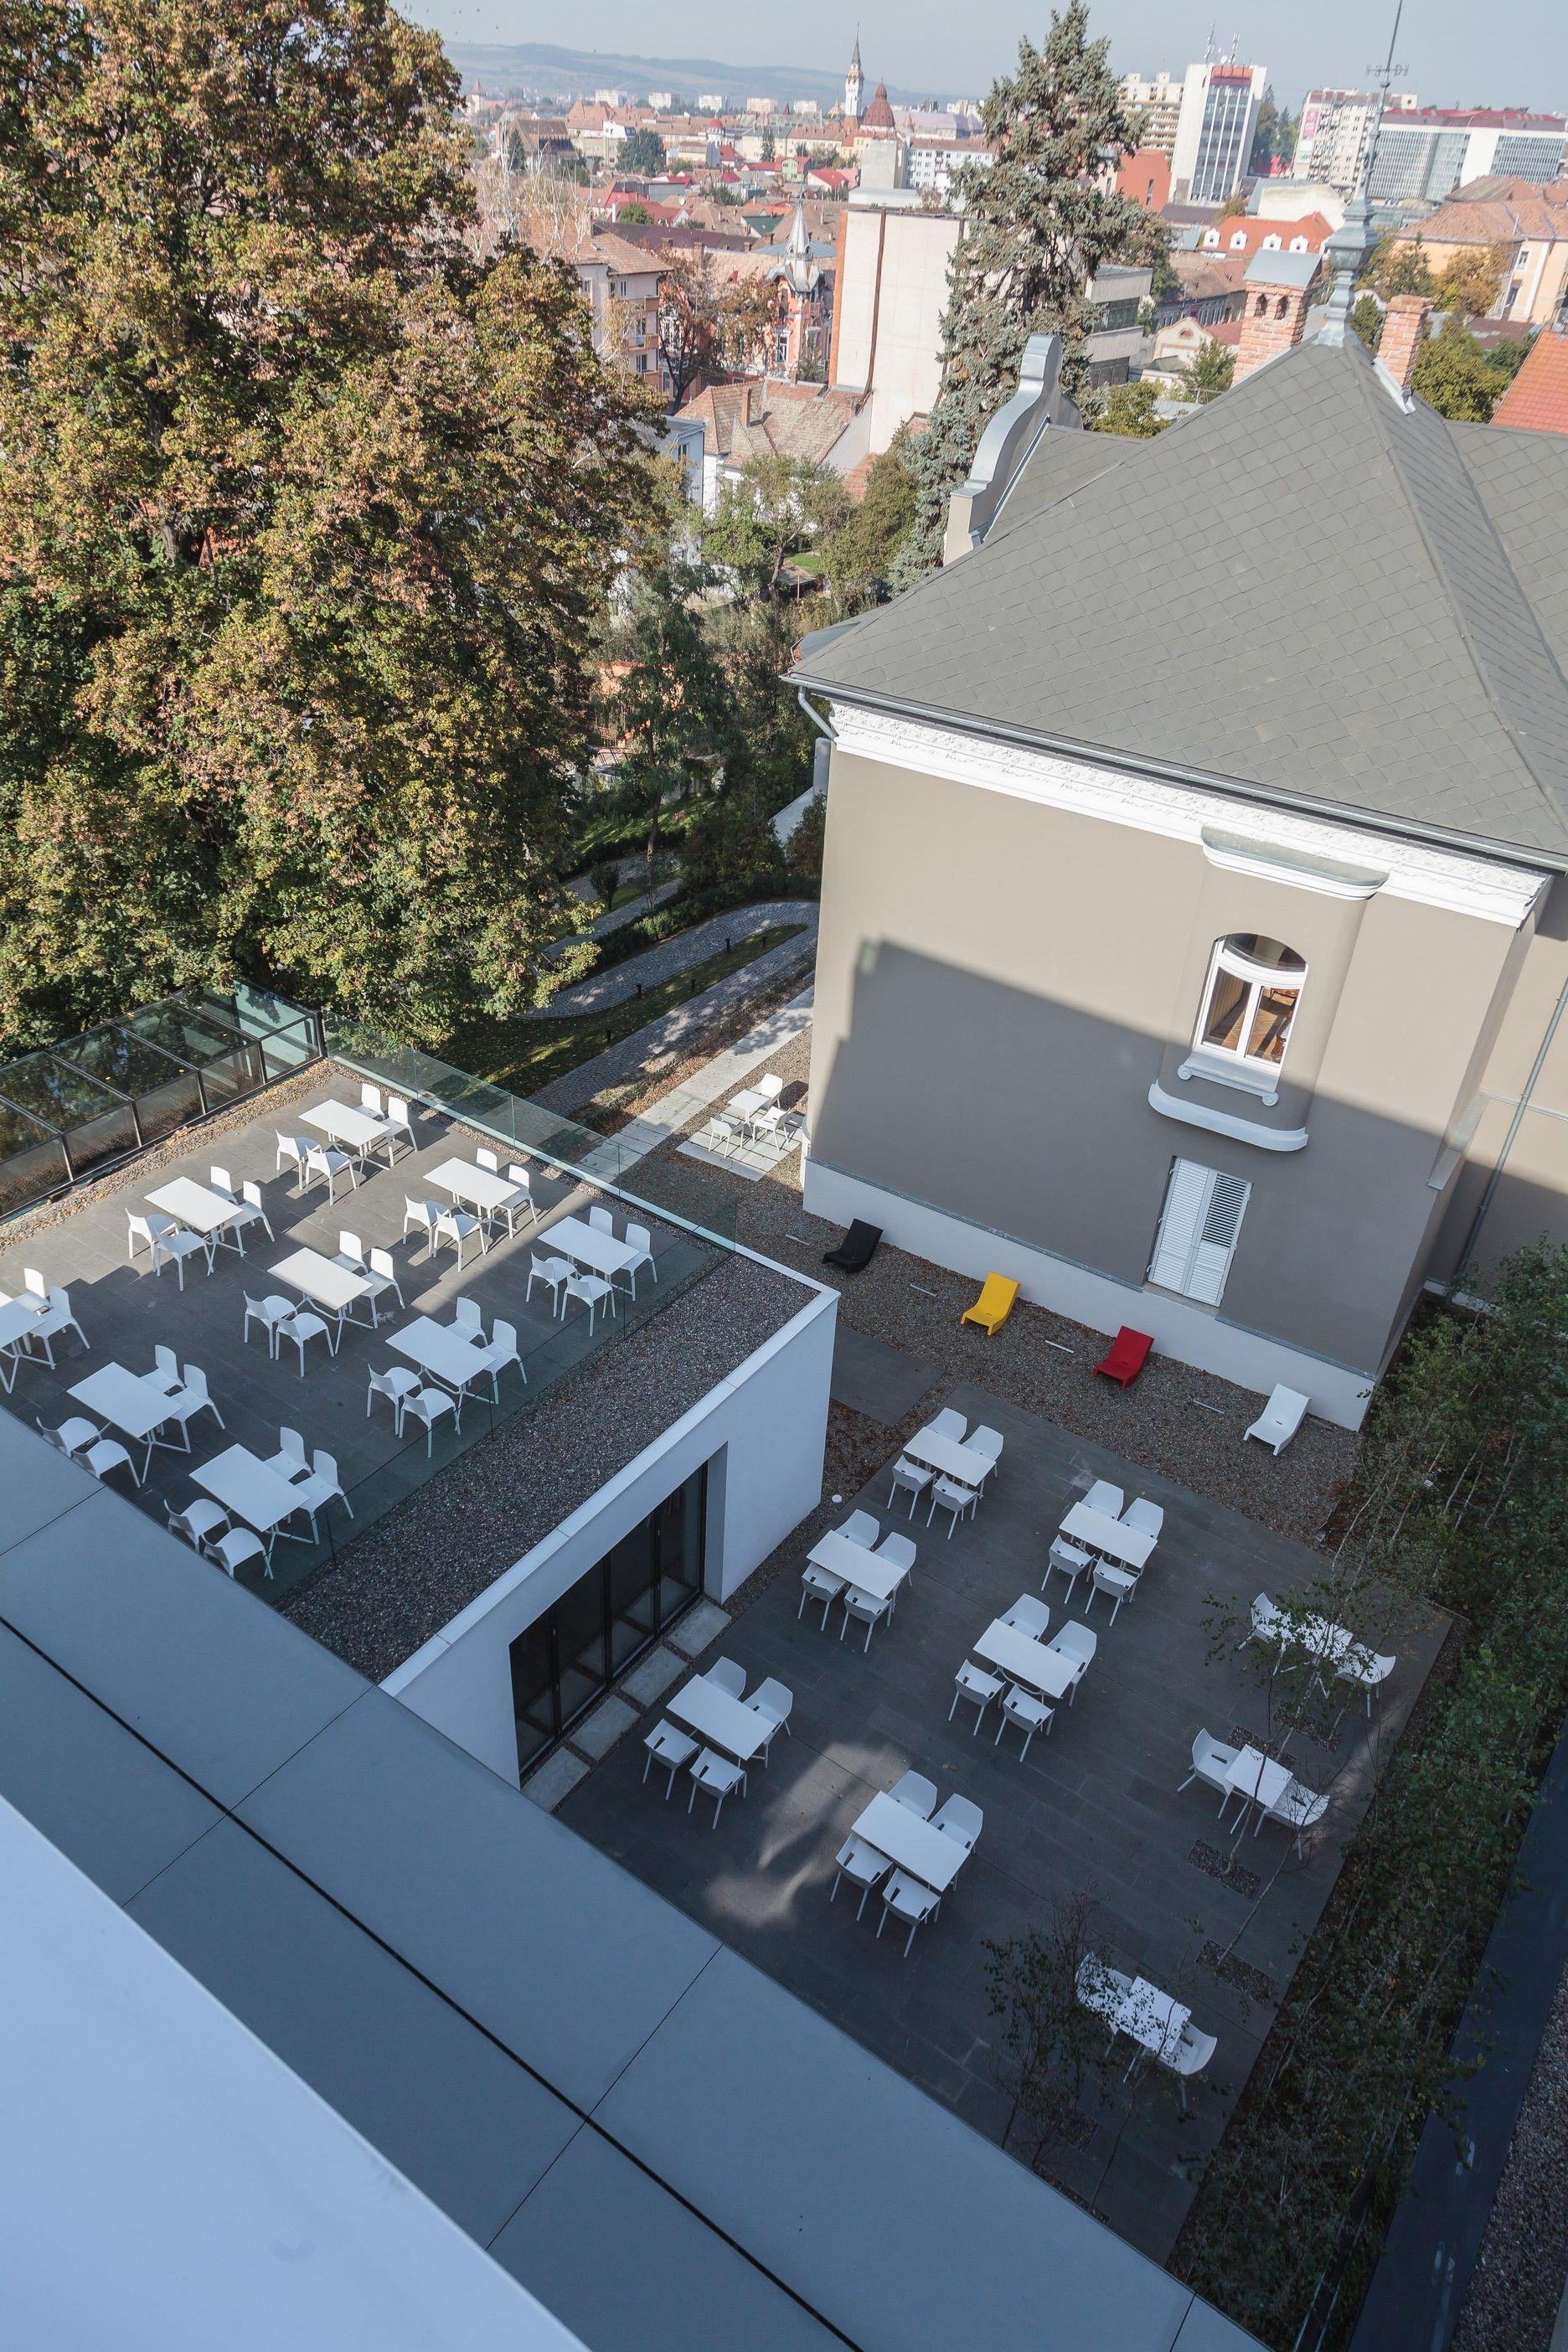 Mem Chair + Plana Chair + Poule table by Kristalia @ Hotel Privo 27, Gh. Doja Street 540342 Tg. Mureş, Romania #pillet #norguet #bistrofurniture #outdoorliving